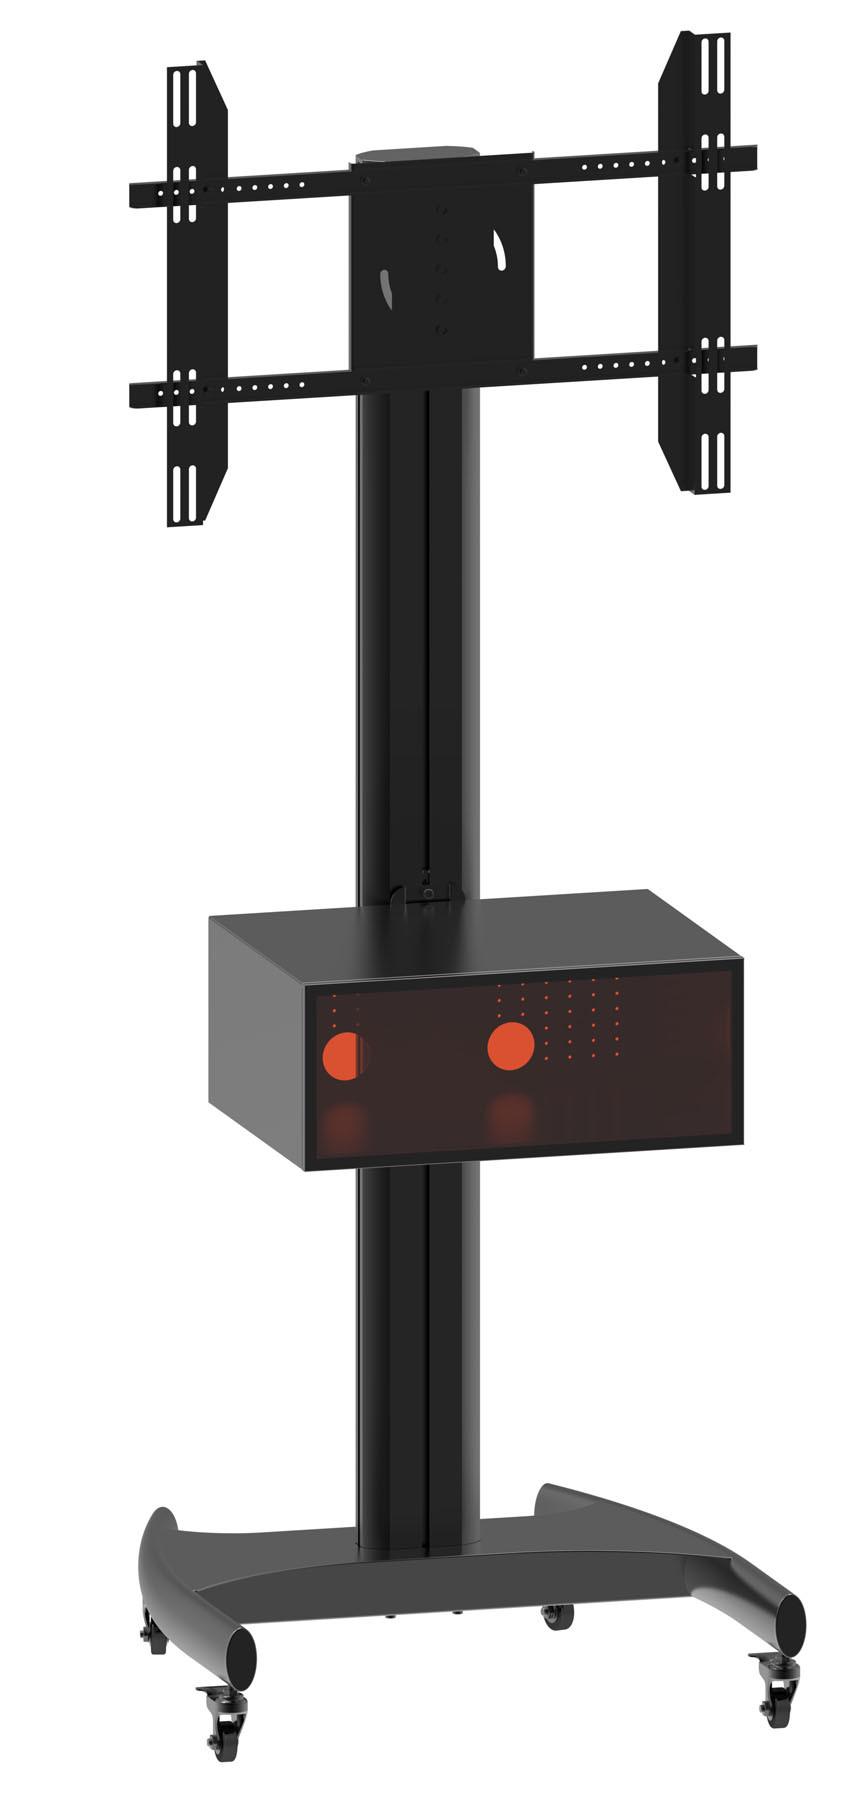 "Public TV Floor Stand Wheel Base 30-60"" Landscape & Portrait (AVB 106C)"